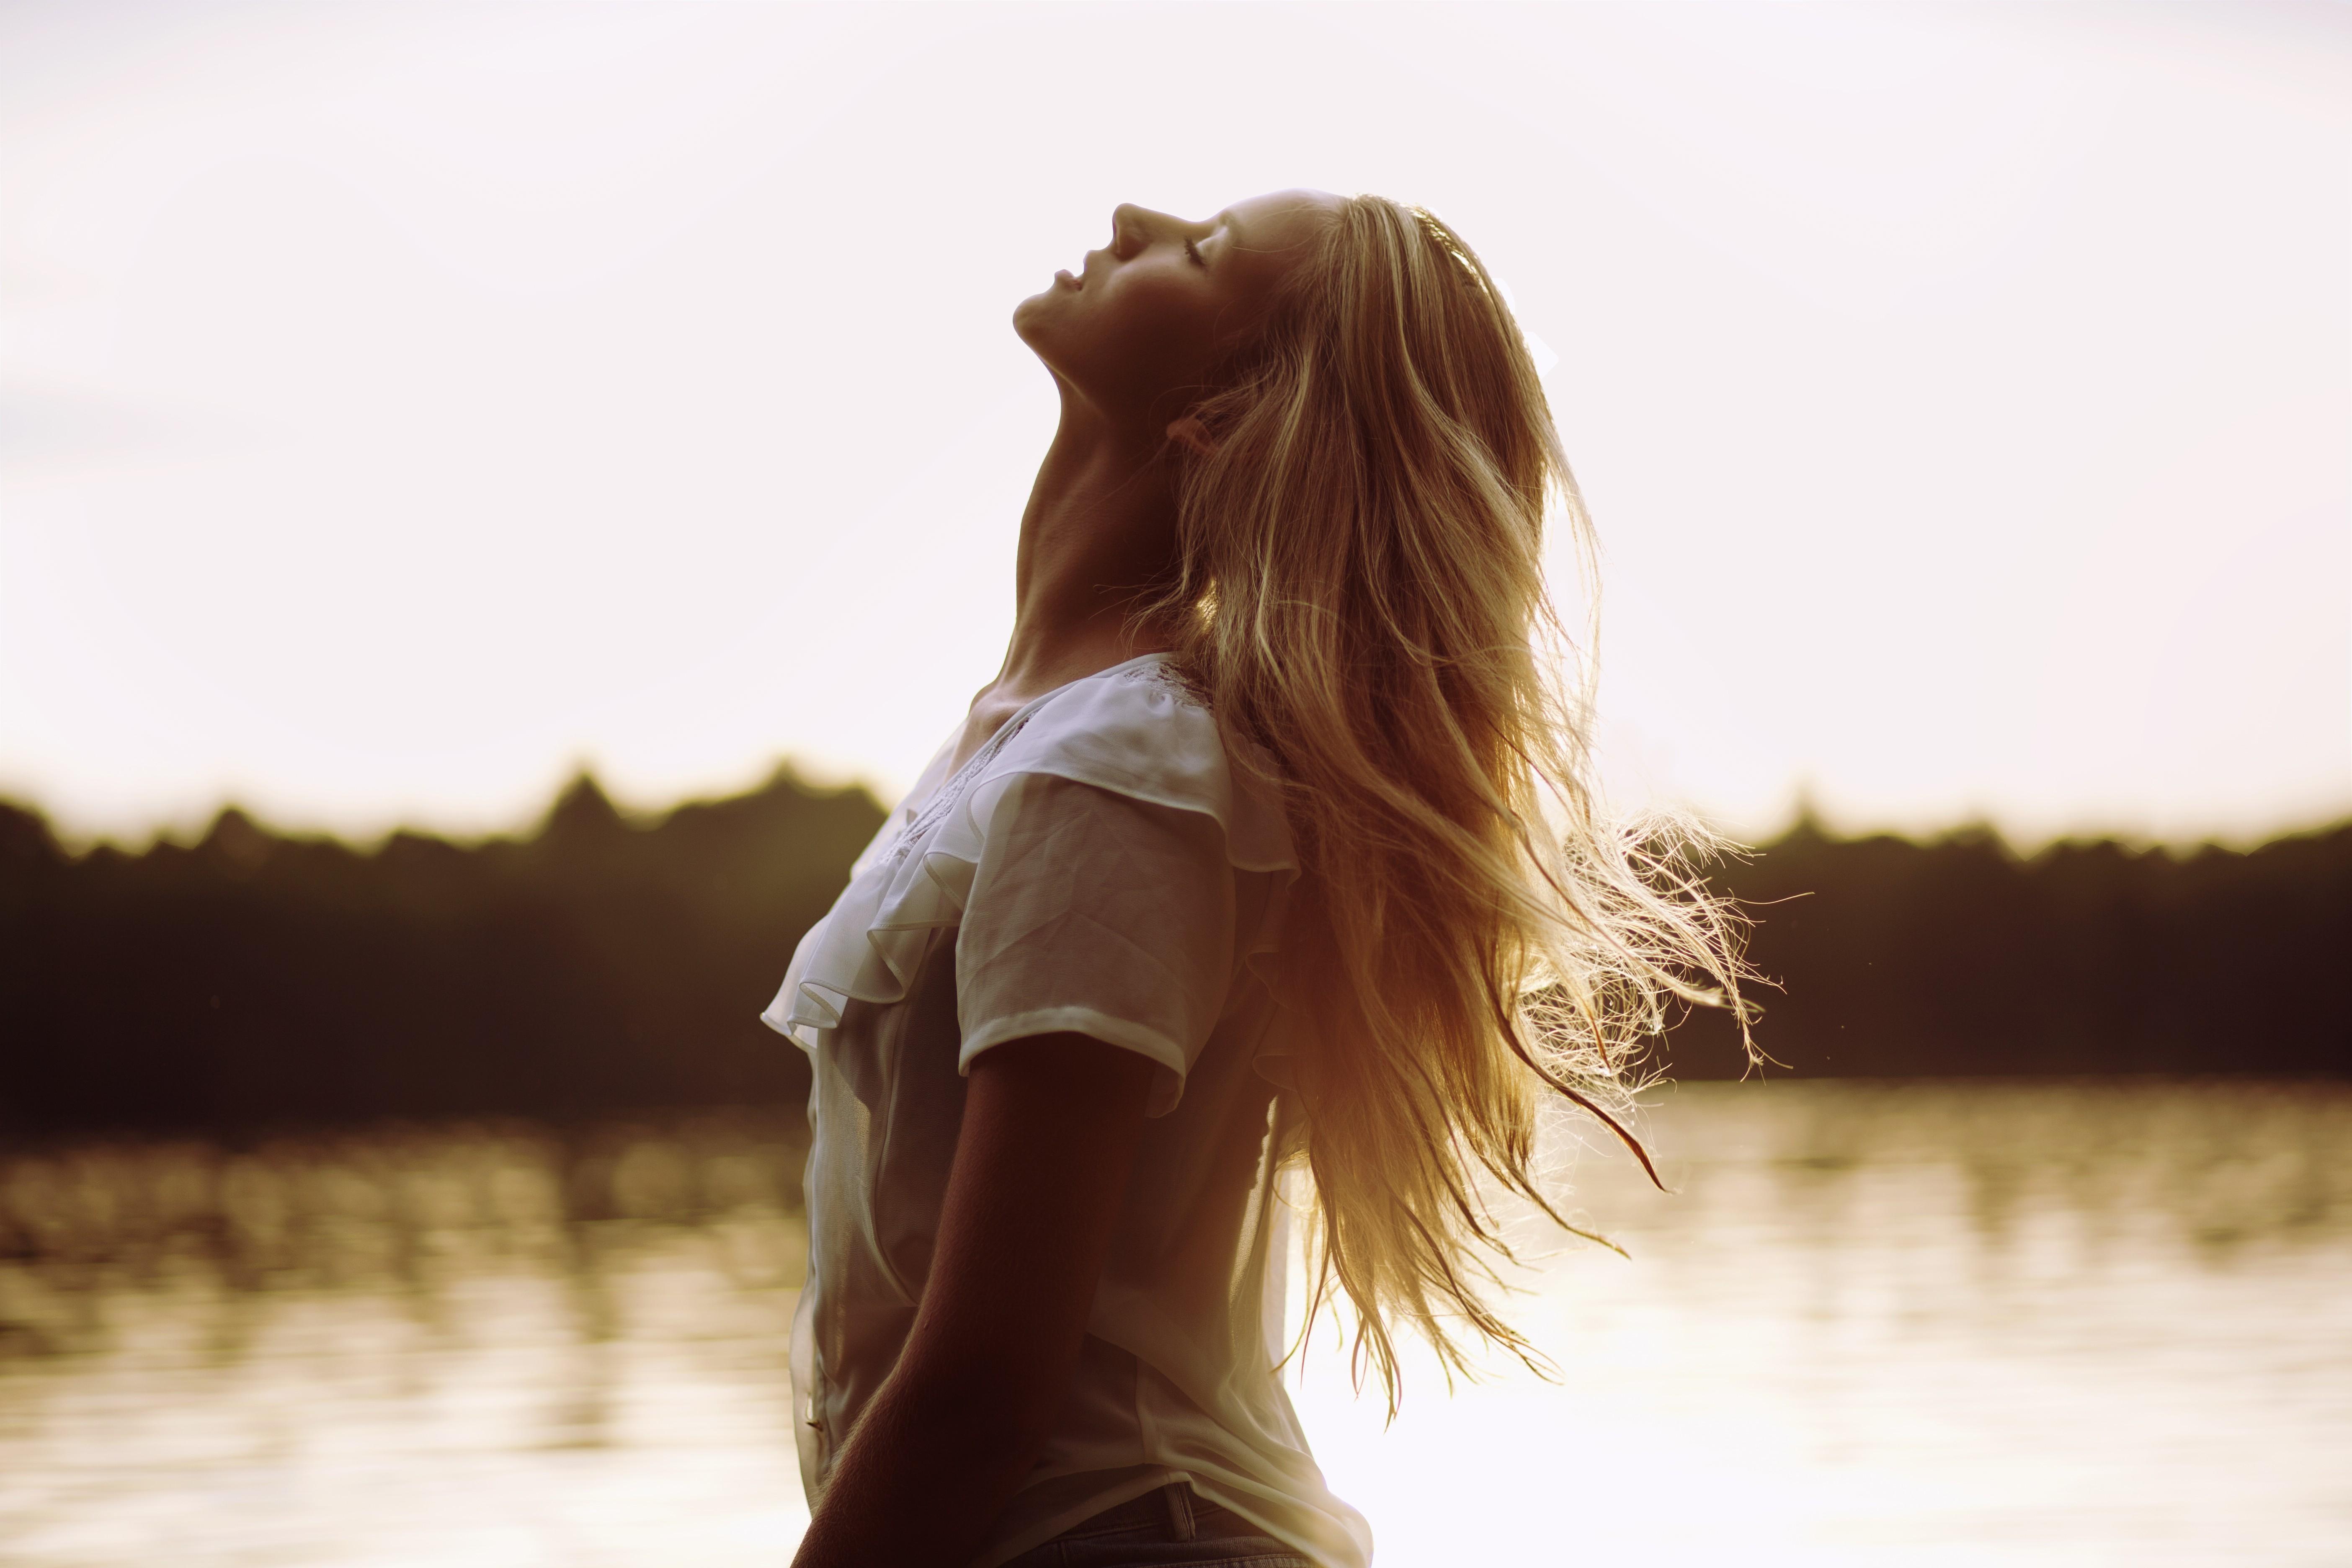 Wallpaper : sunlight, women outdoors, model, blonde, long ...